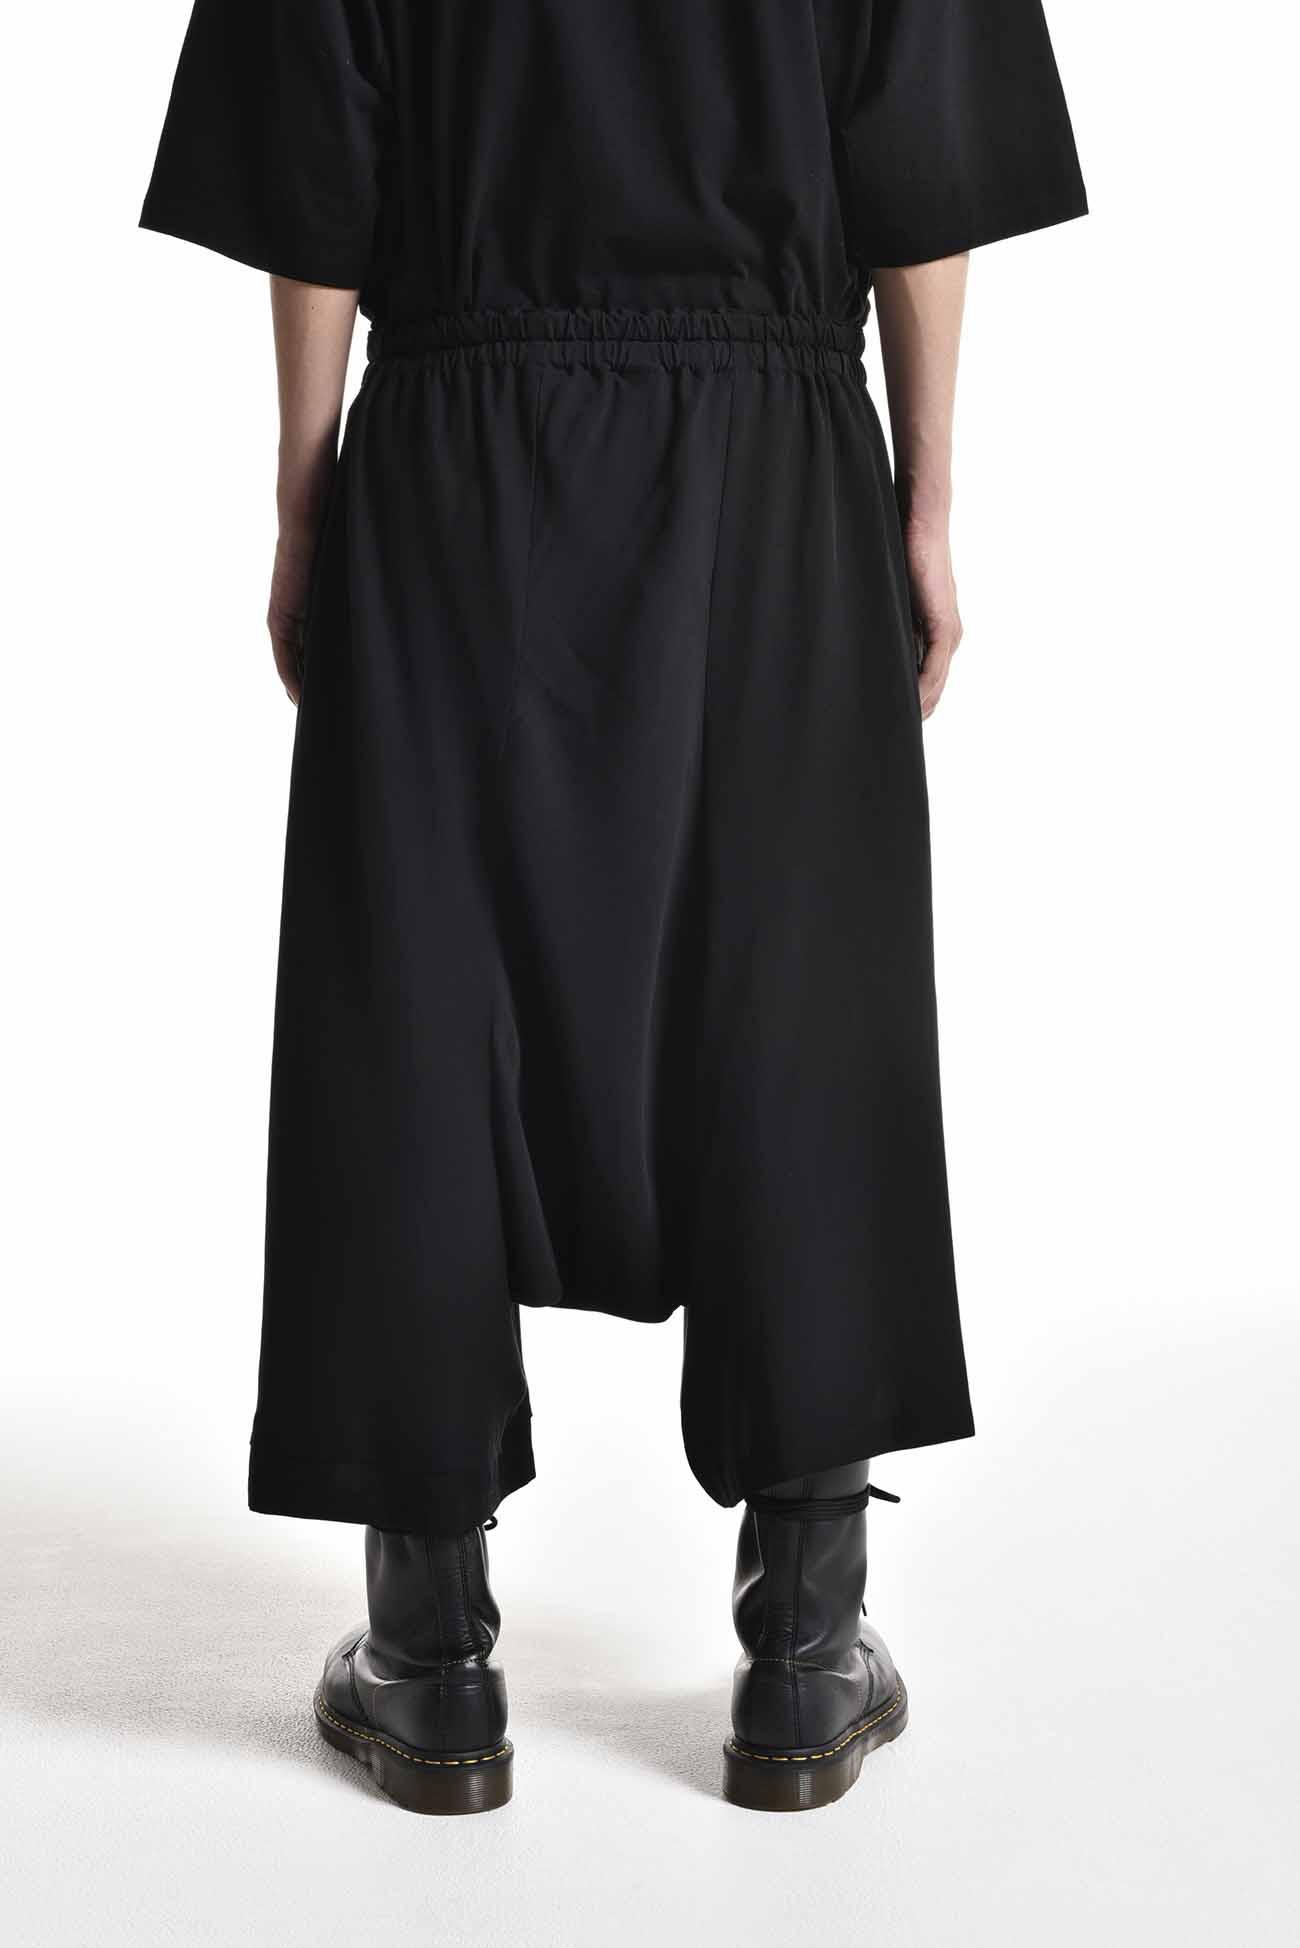 TE/Burberry Left Twisted Pants